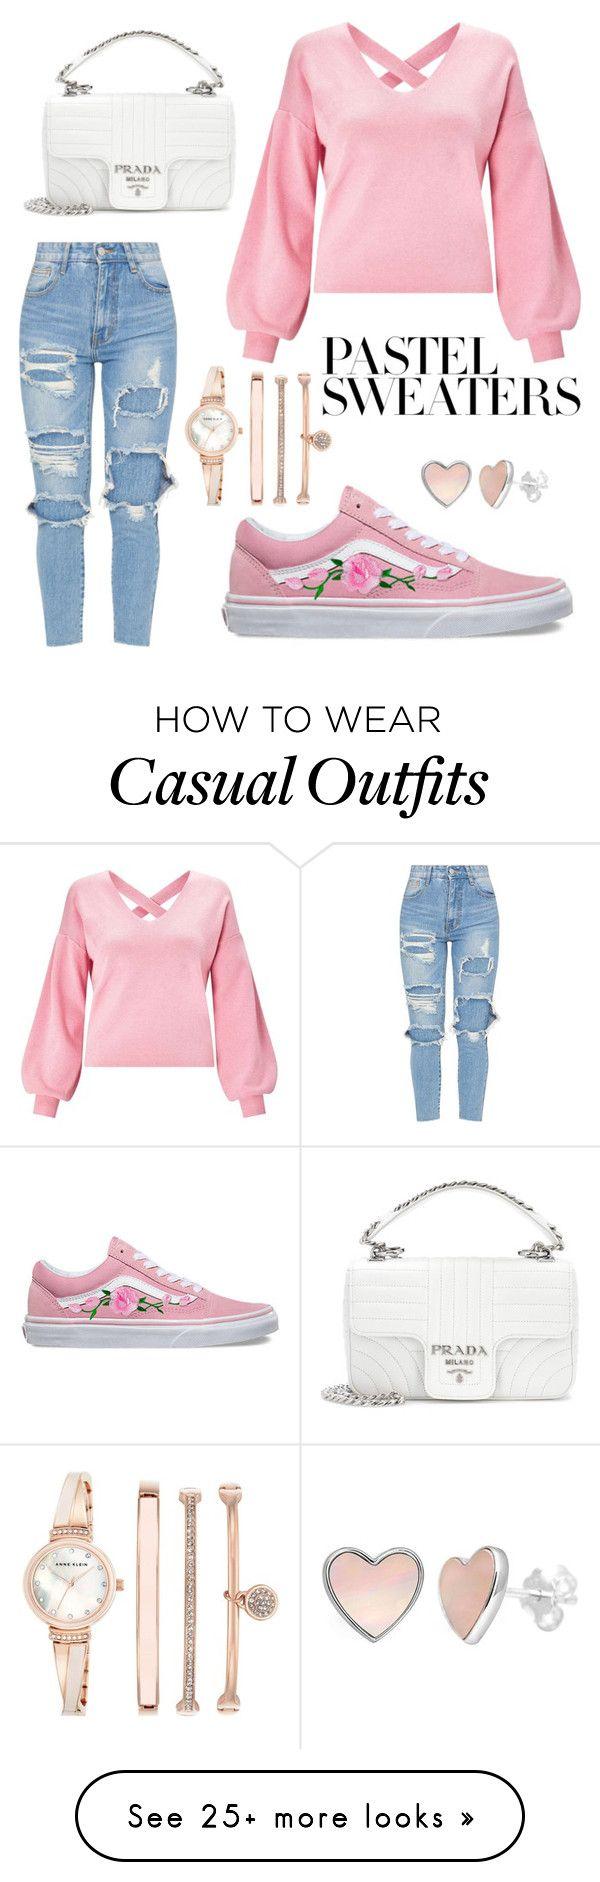 """casual weekend"" by saegerlisa on Polyvore featuring Miss Selfridge, Vans, Anne Klein, Prada and pastelsweaters"